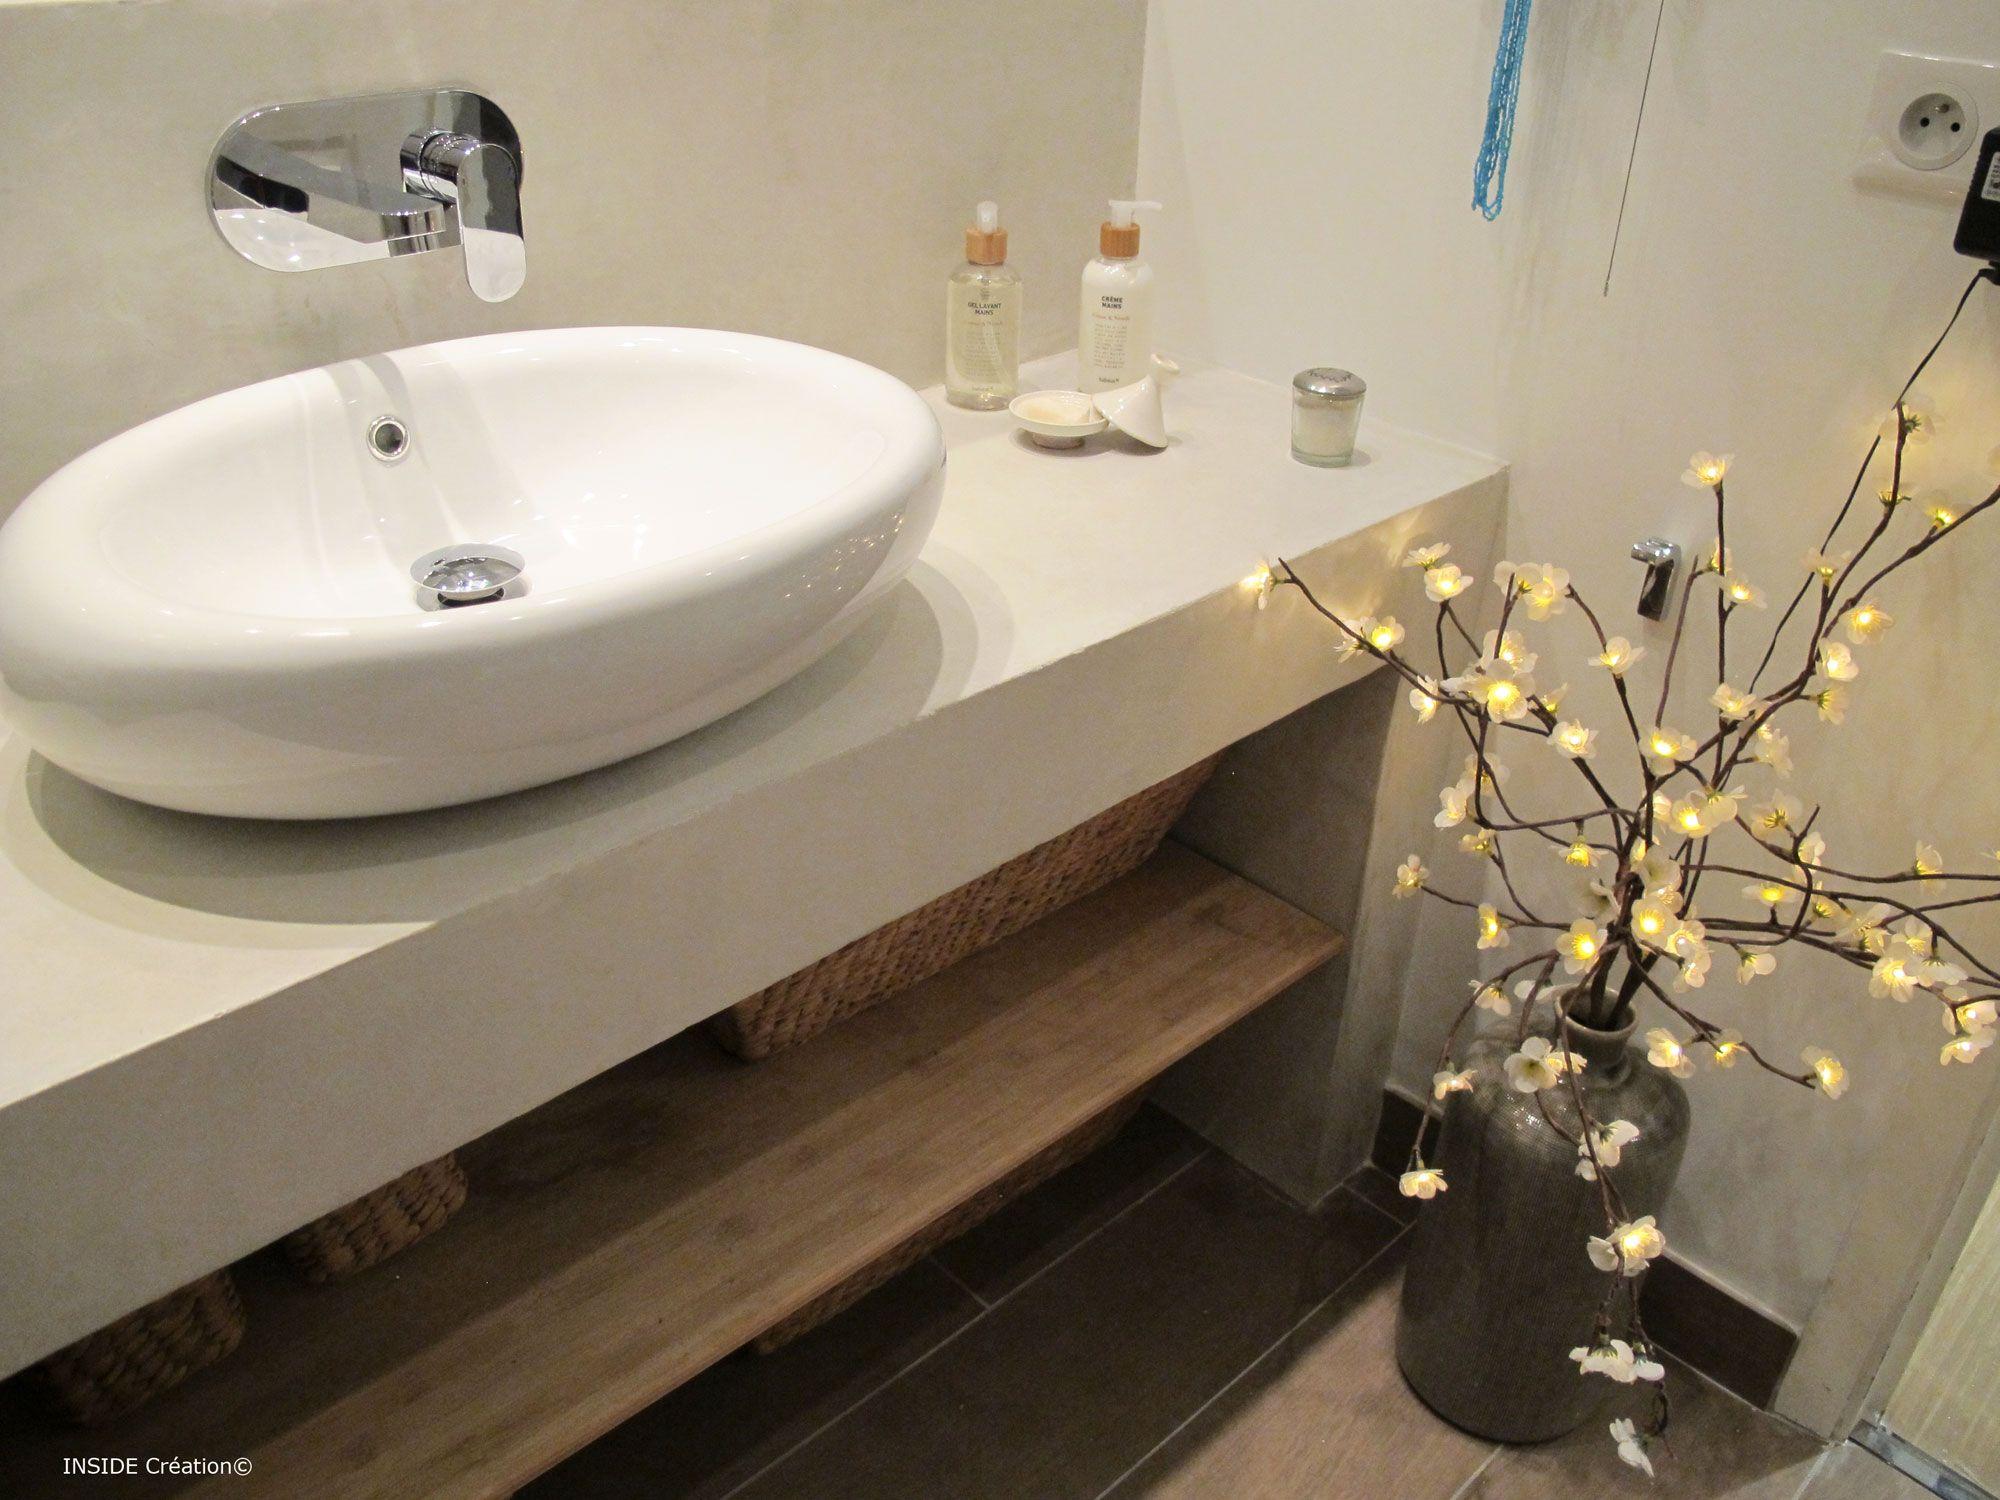 Meuble salle de bain bati recherche google pauline for Recherche meuble salle de bain